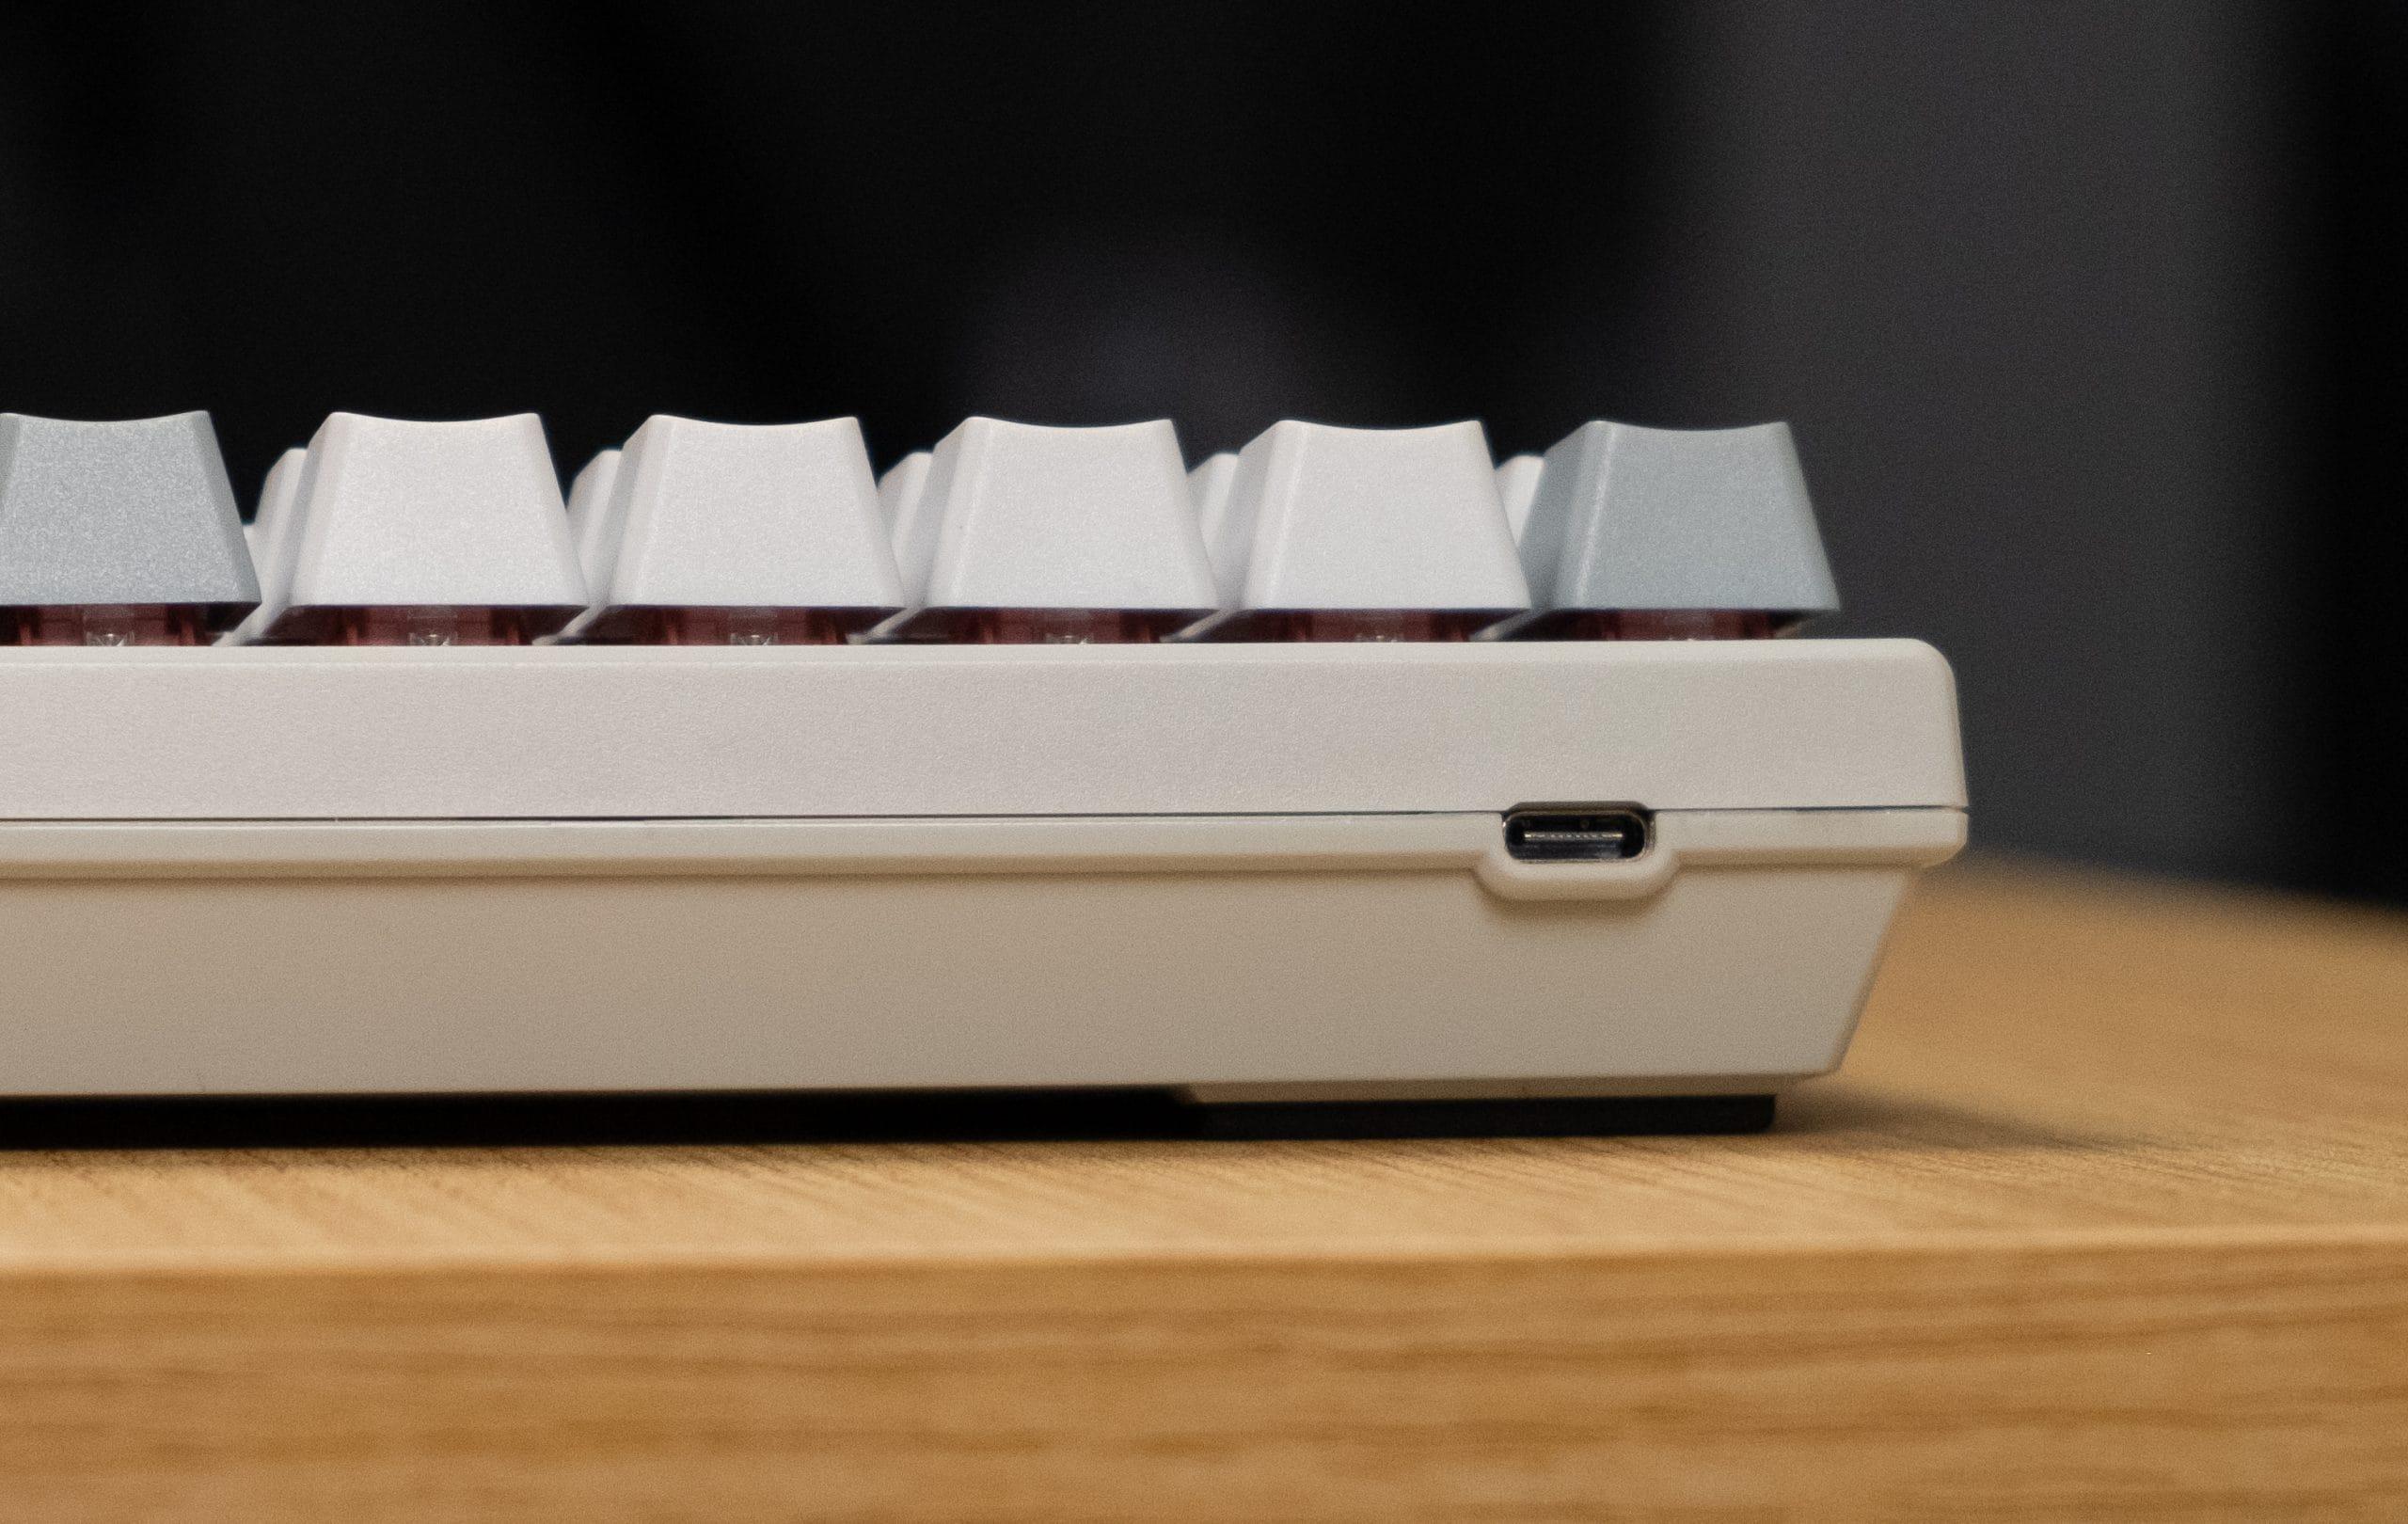 AKKO 3084 - USB-C